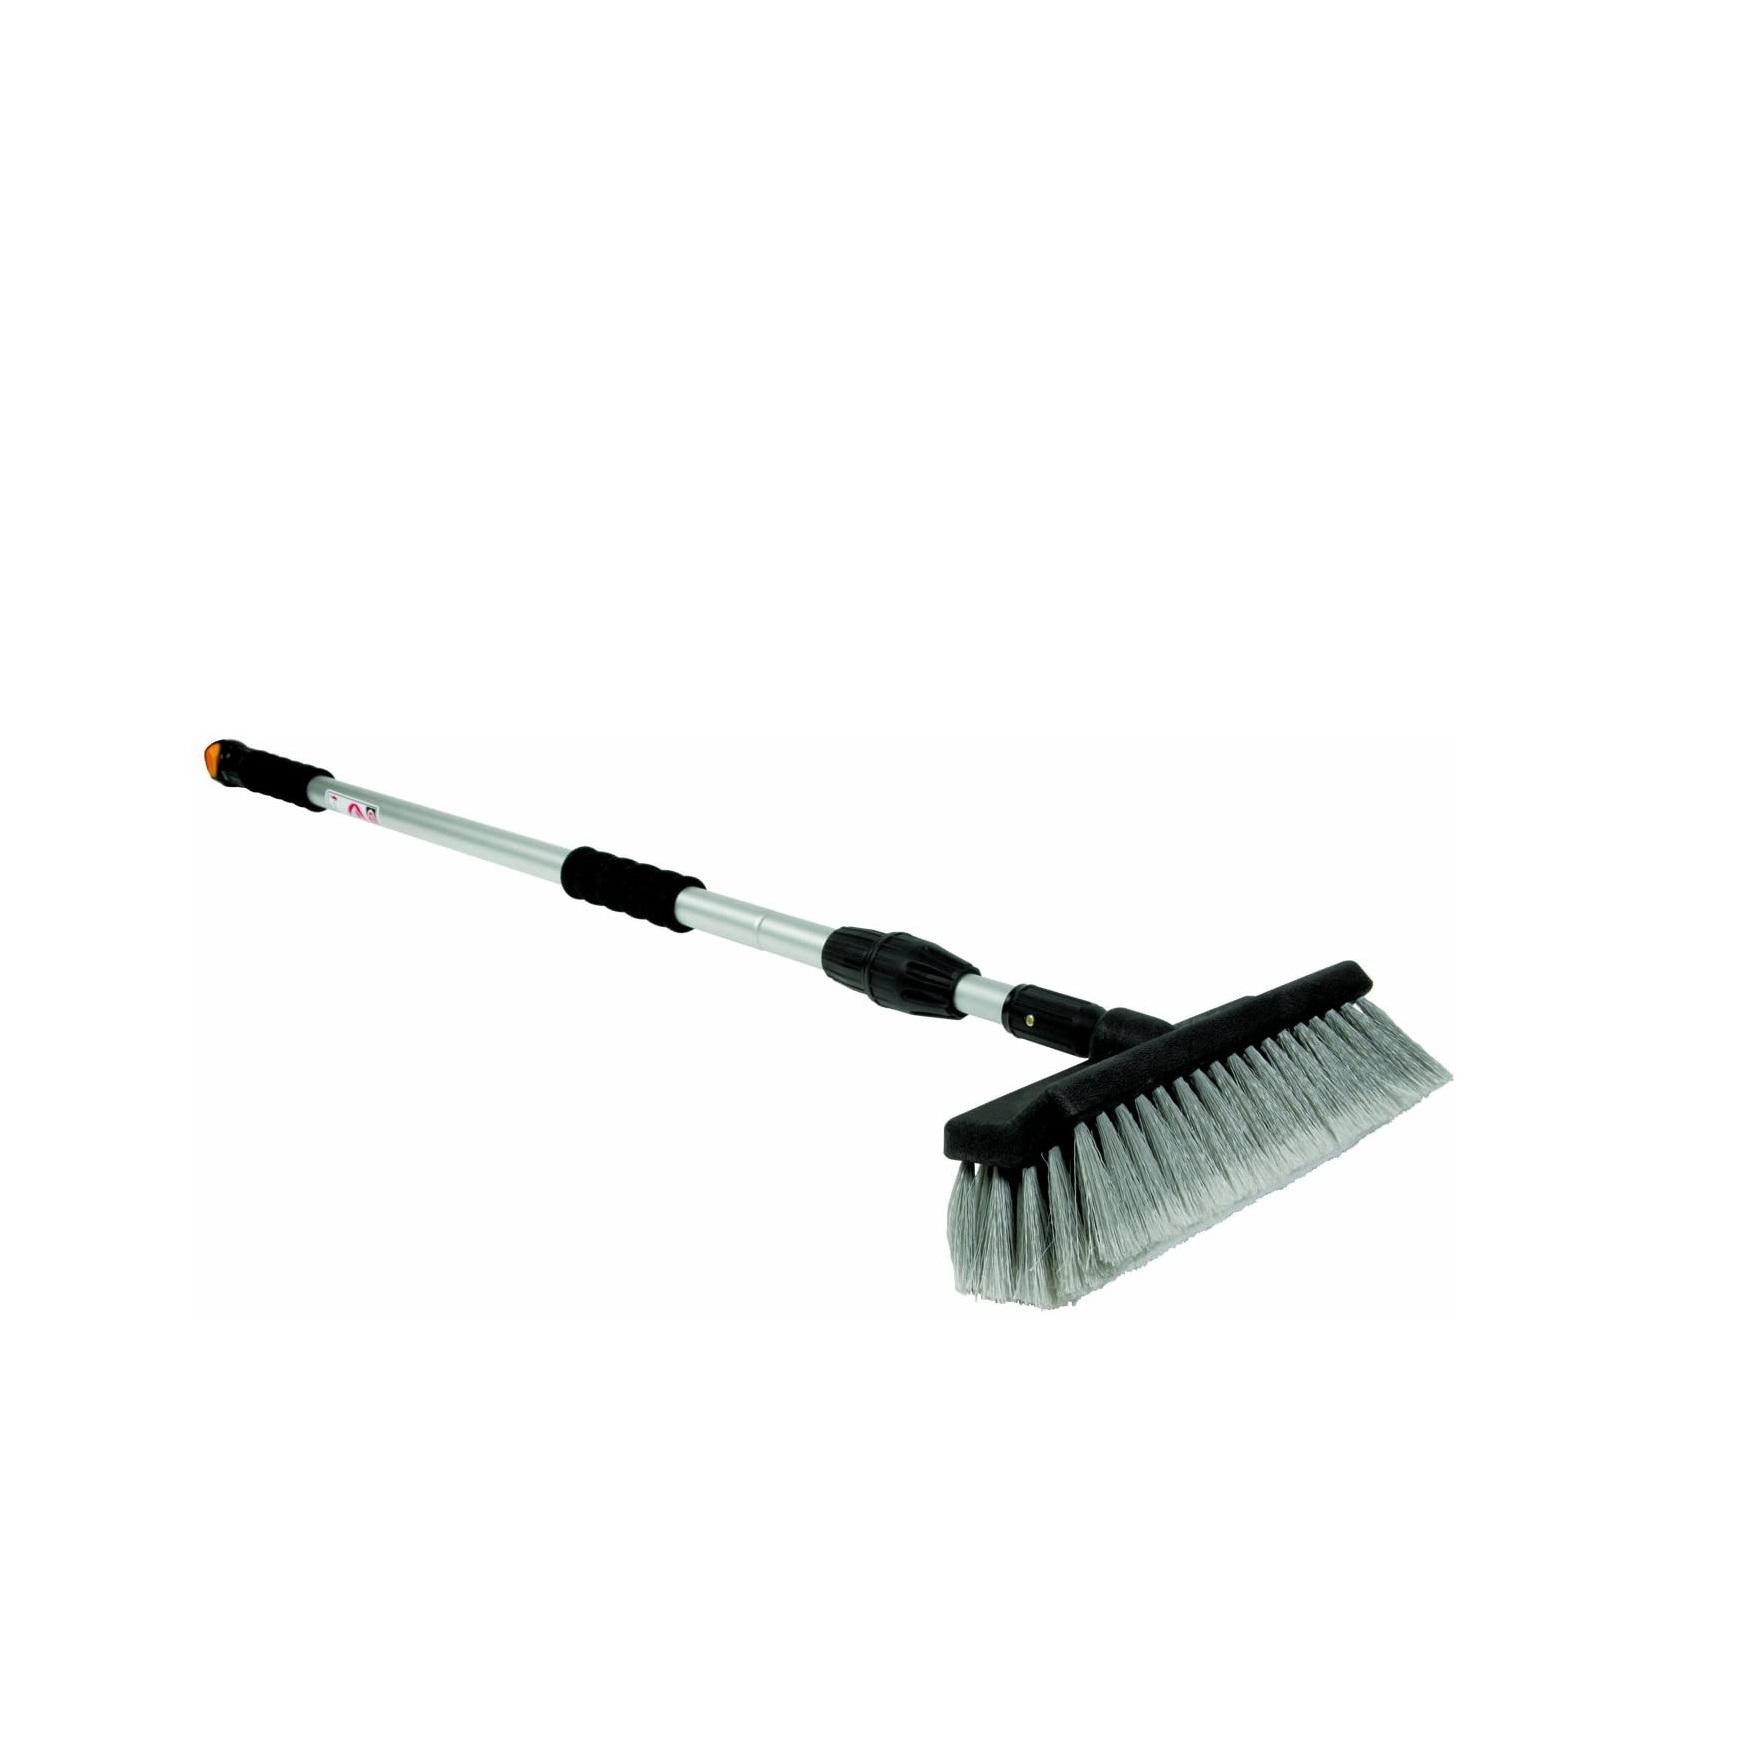 Best RV Wash Brush11